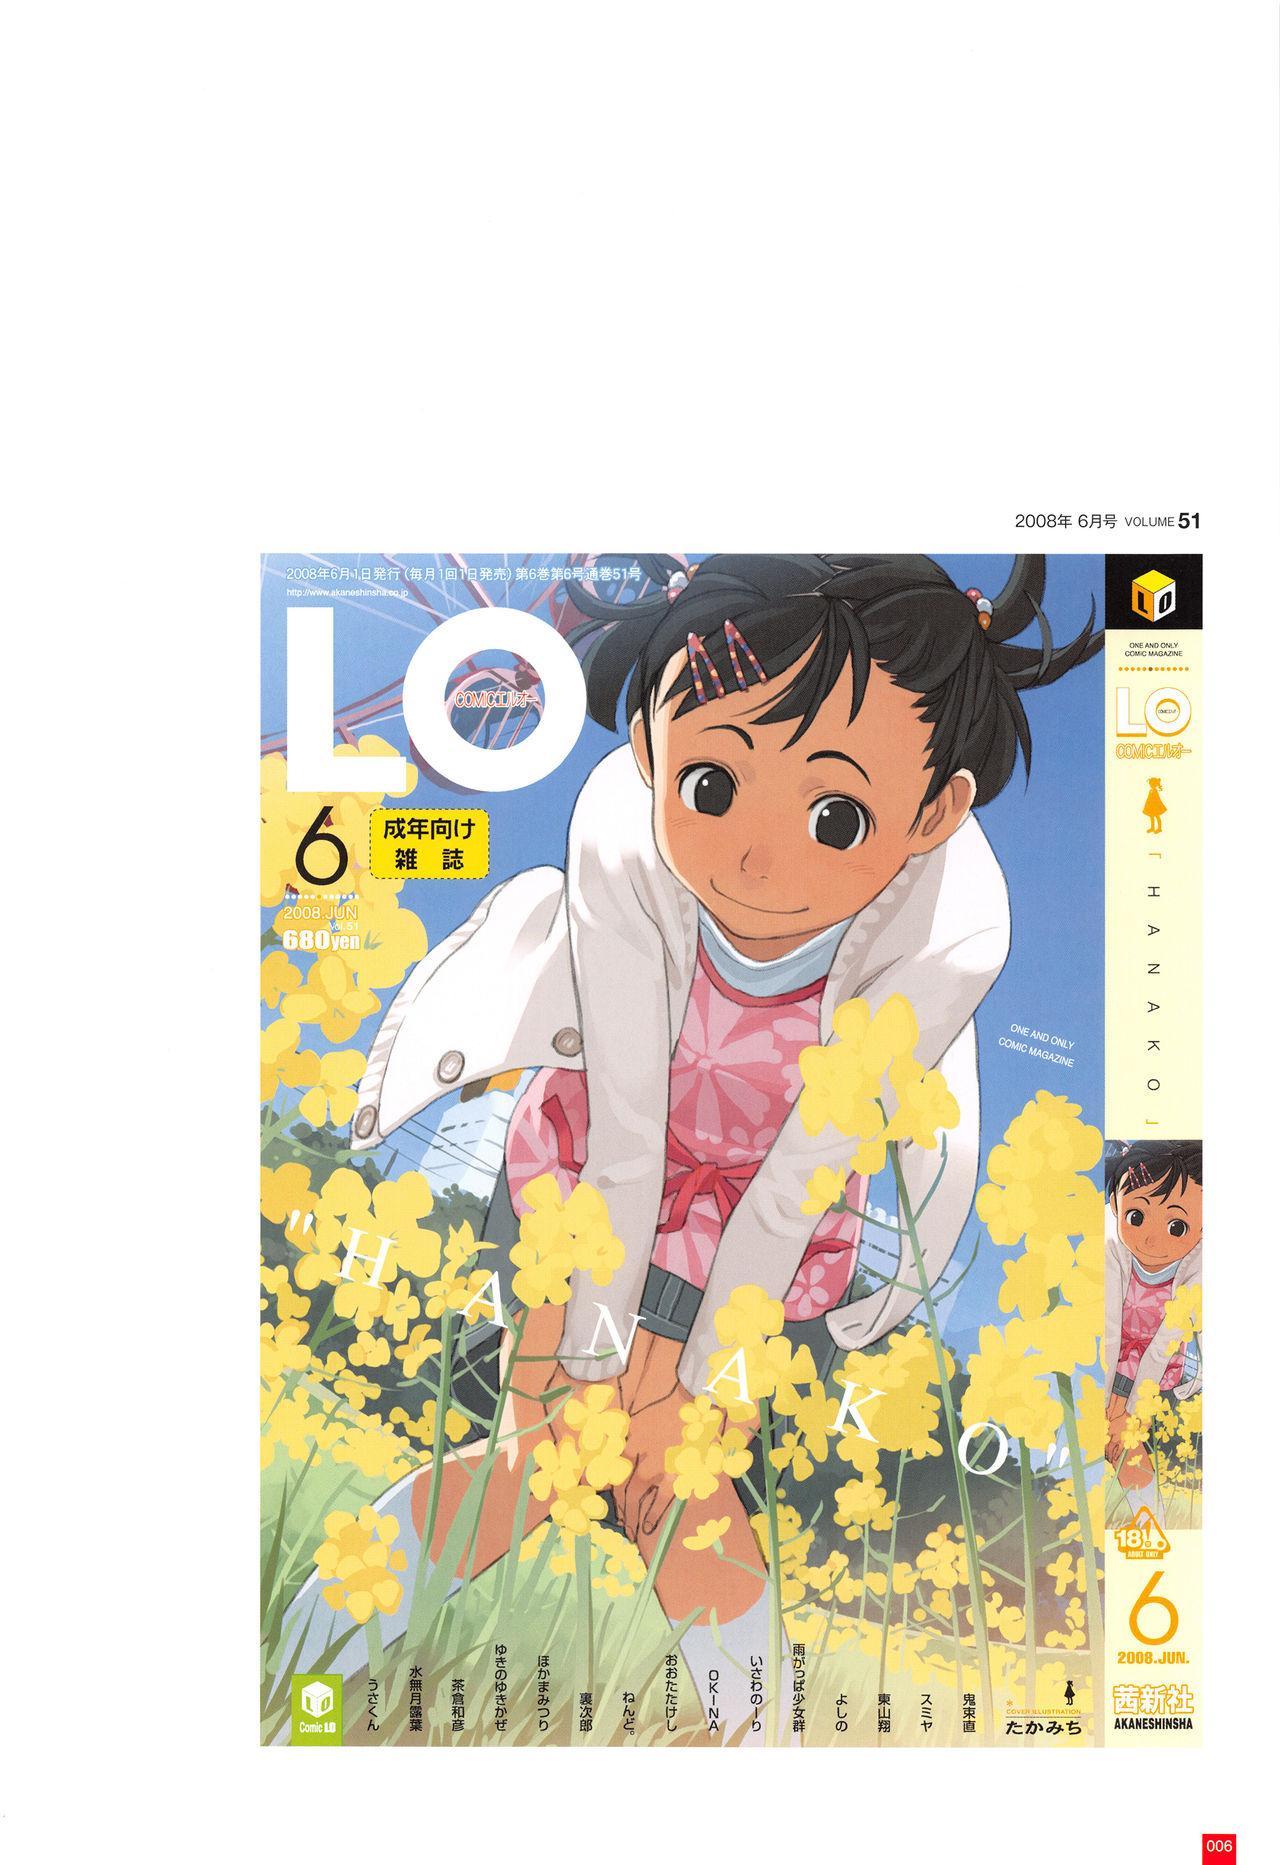 LO Artbook 2-A TAKAMICHI LOOP WORKS 8